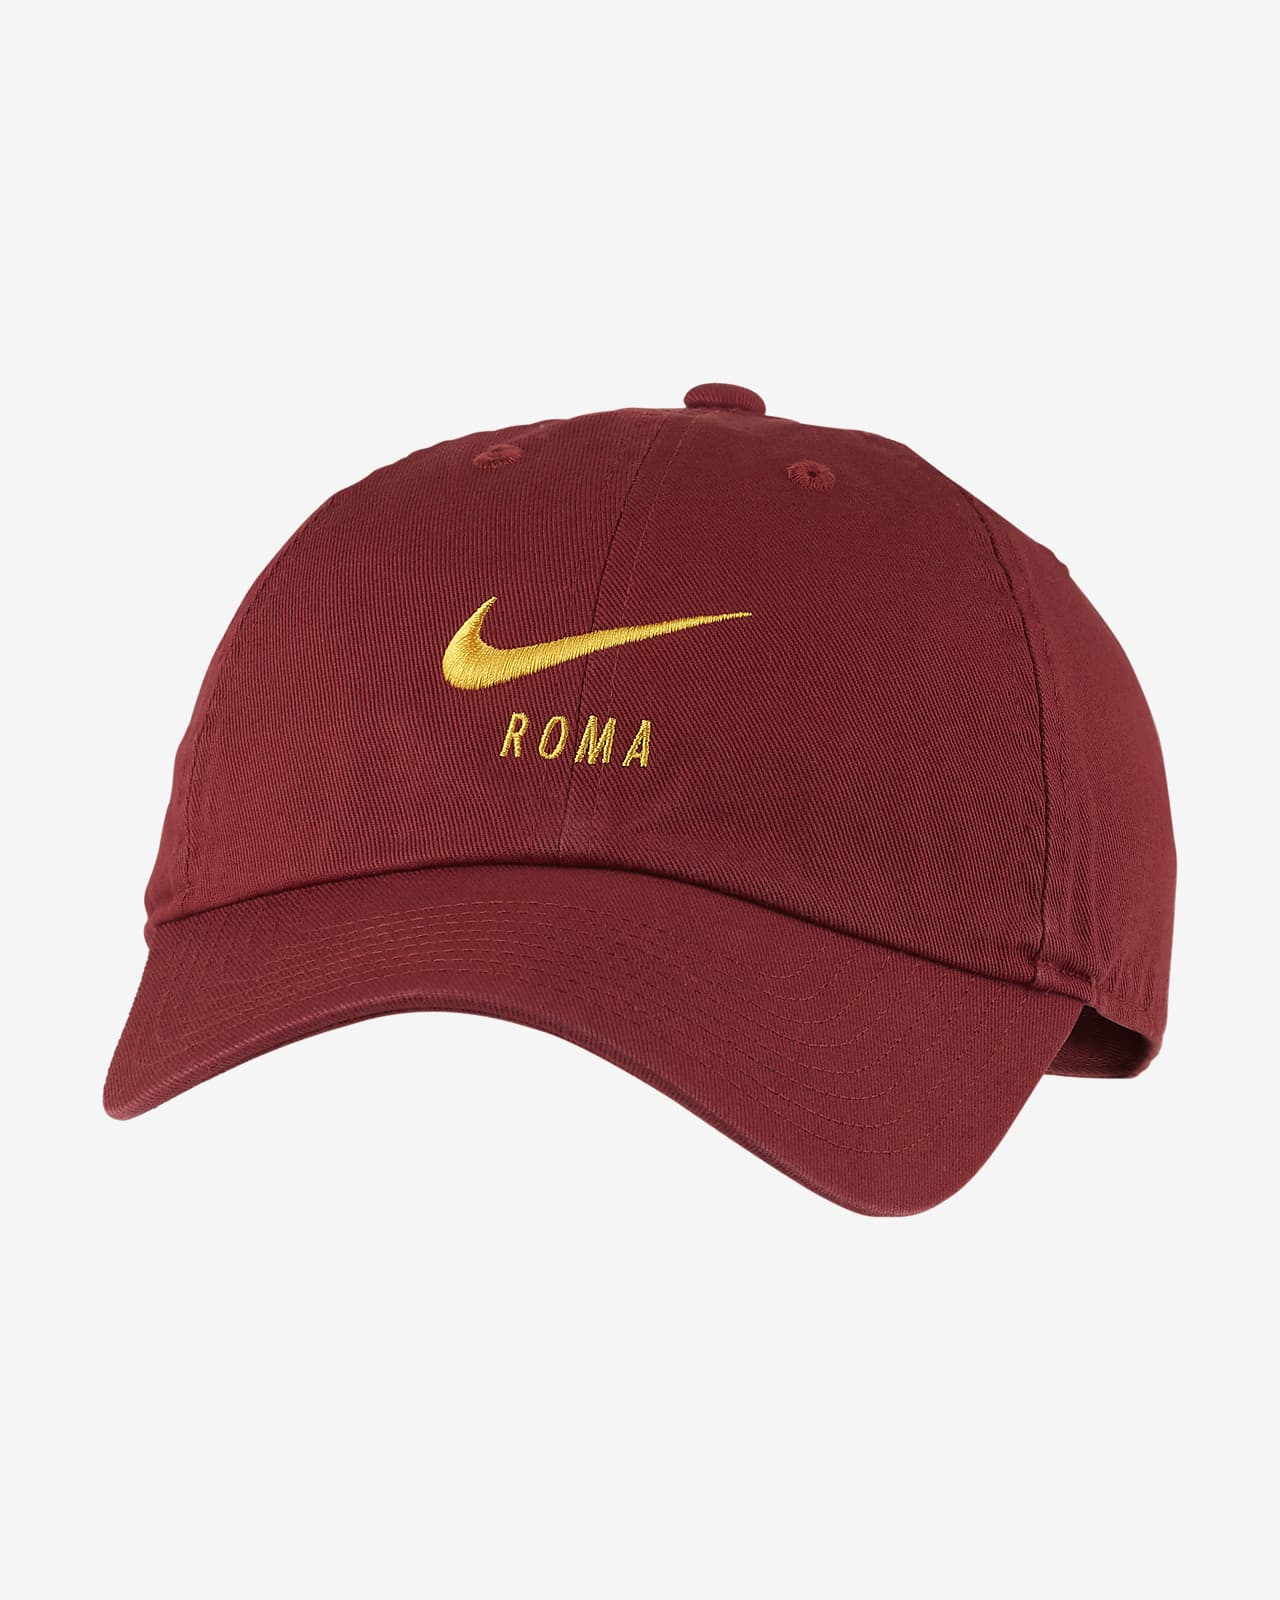 A.S. Roma Heritage86 Verstelbare pet